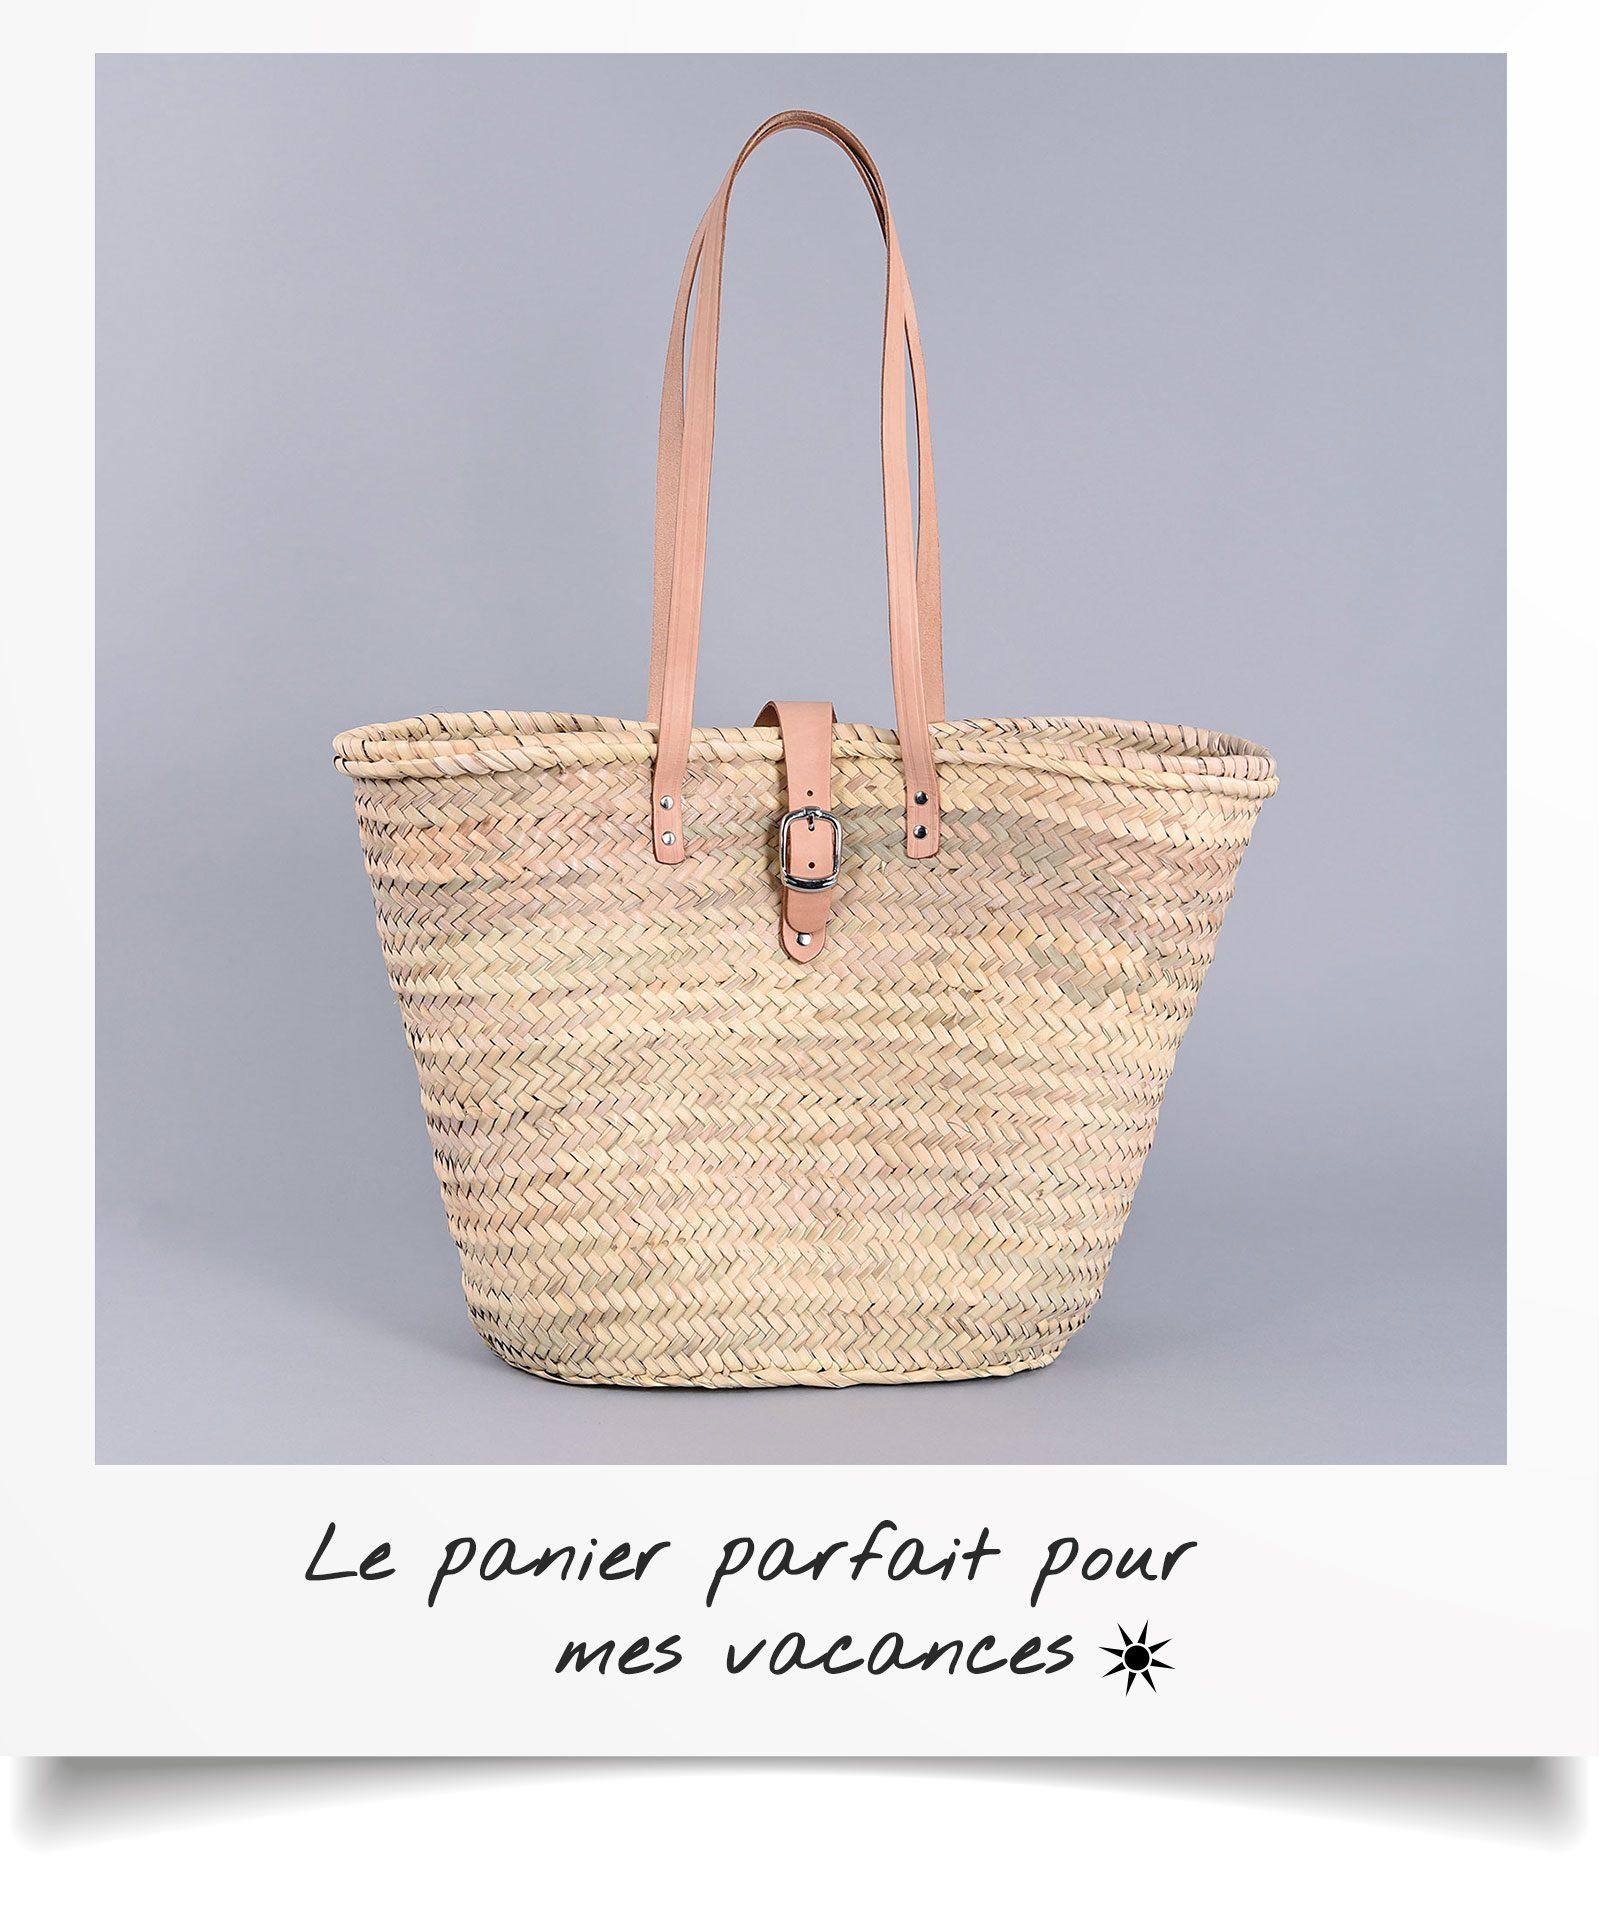 http://lookbook.allee-du-foulard.fr/wp-content/uploads/2018/06/0680-ADF-Accessoires-de-mode-LB-Soldes-Ete-panier-benissa-1600x1930.jpg